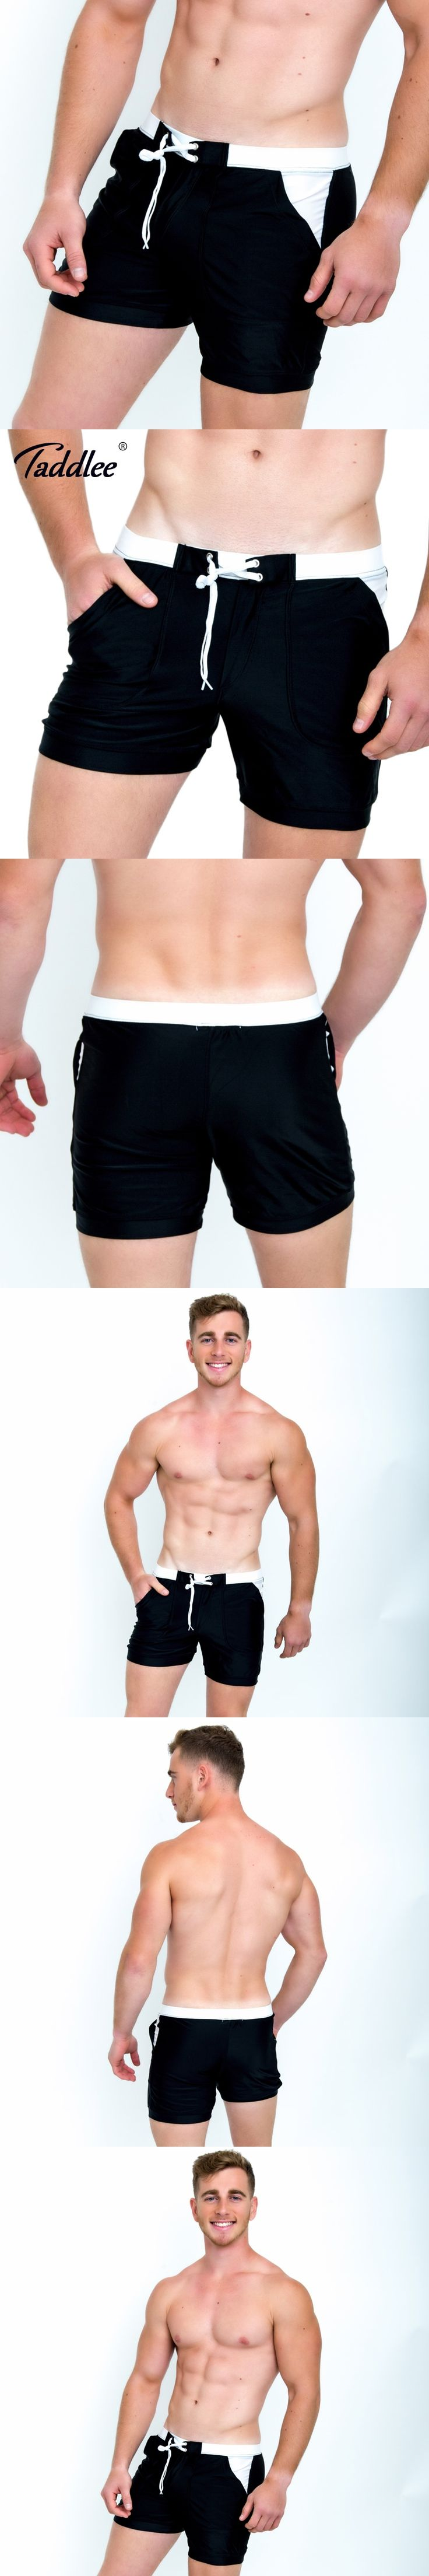 Taddlee Brand Hot Sale Sexy Men Swimwear Swim Boxer Trunks Beach Board Shorts Plus Big Size Solid Color Basic Men's Swimsuits